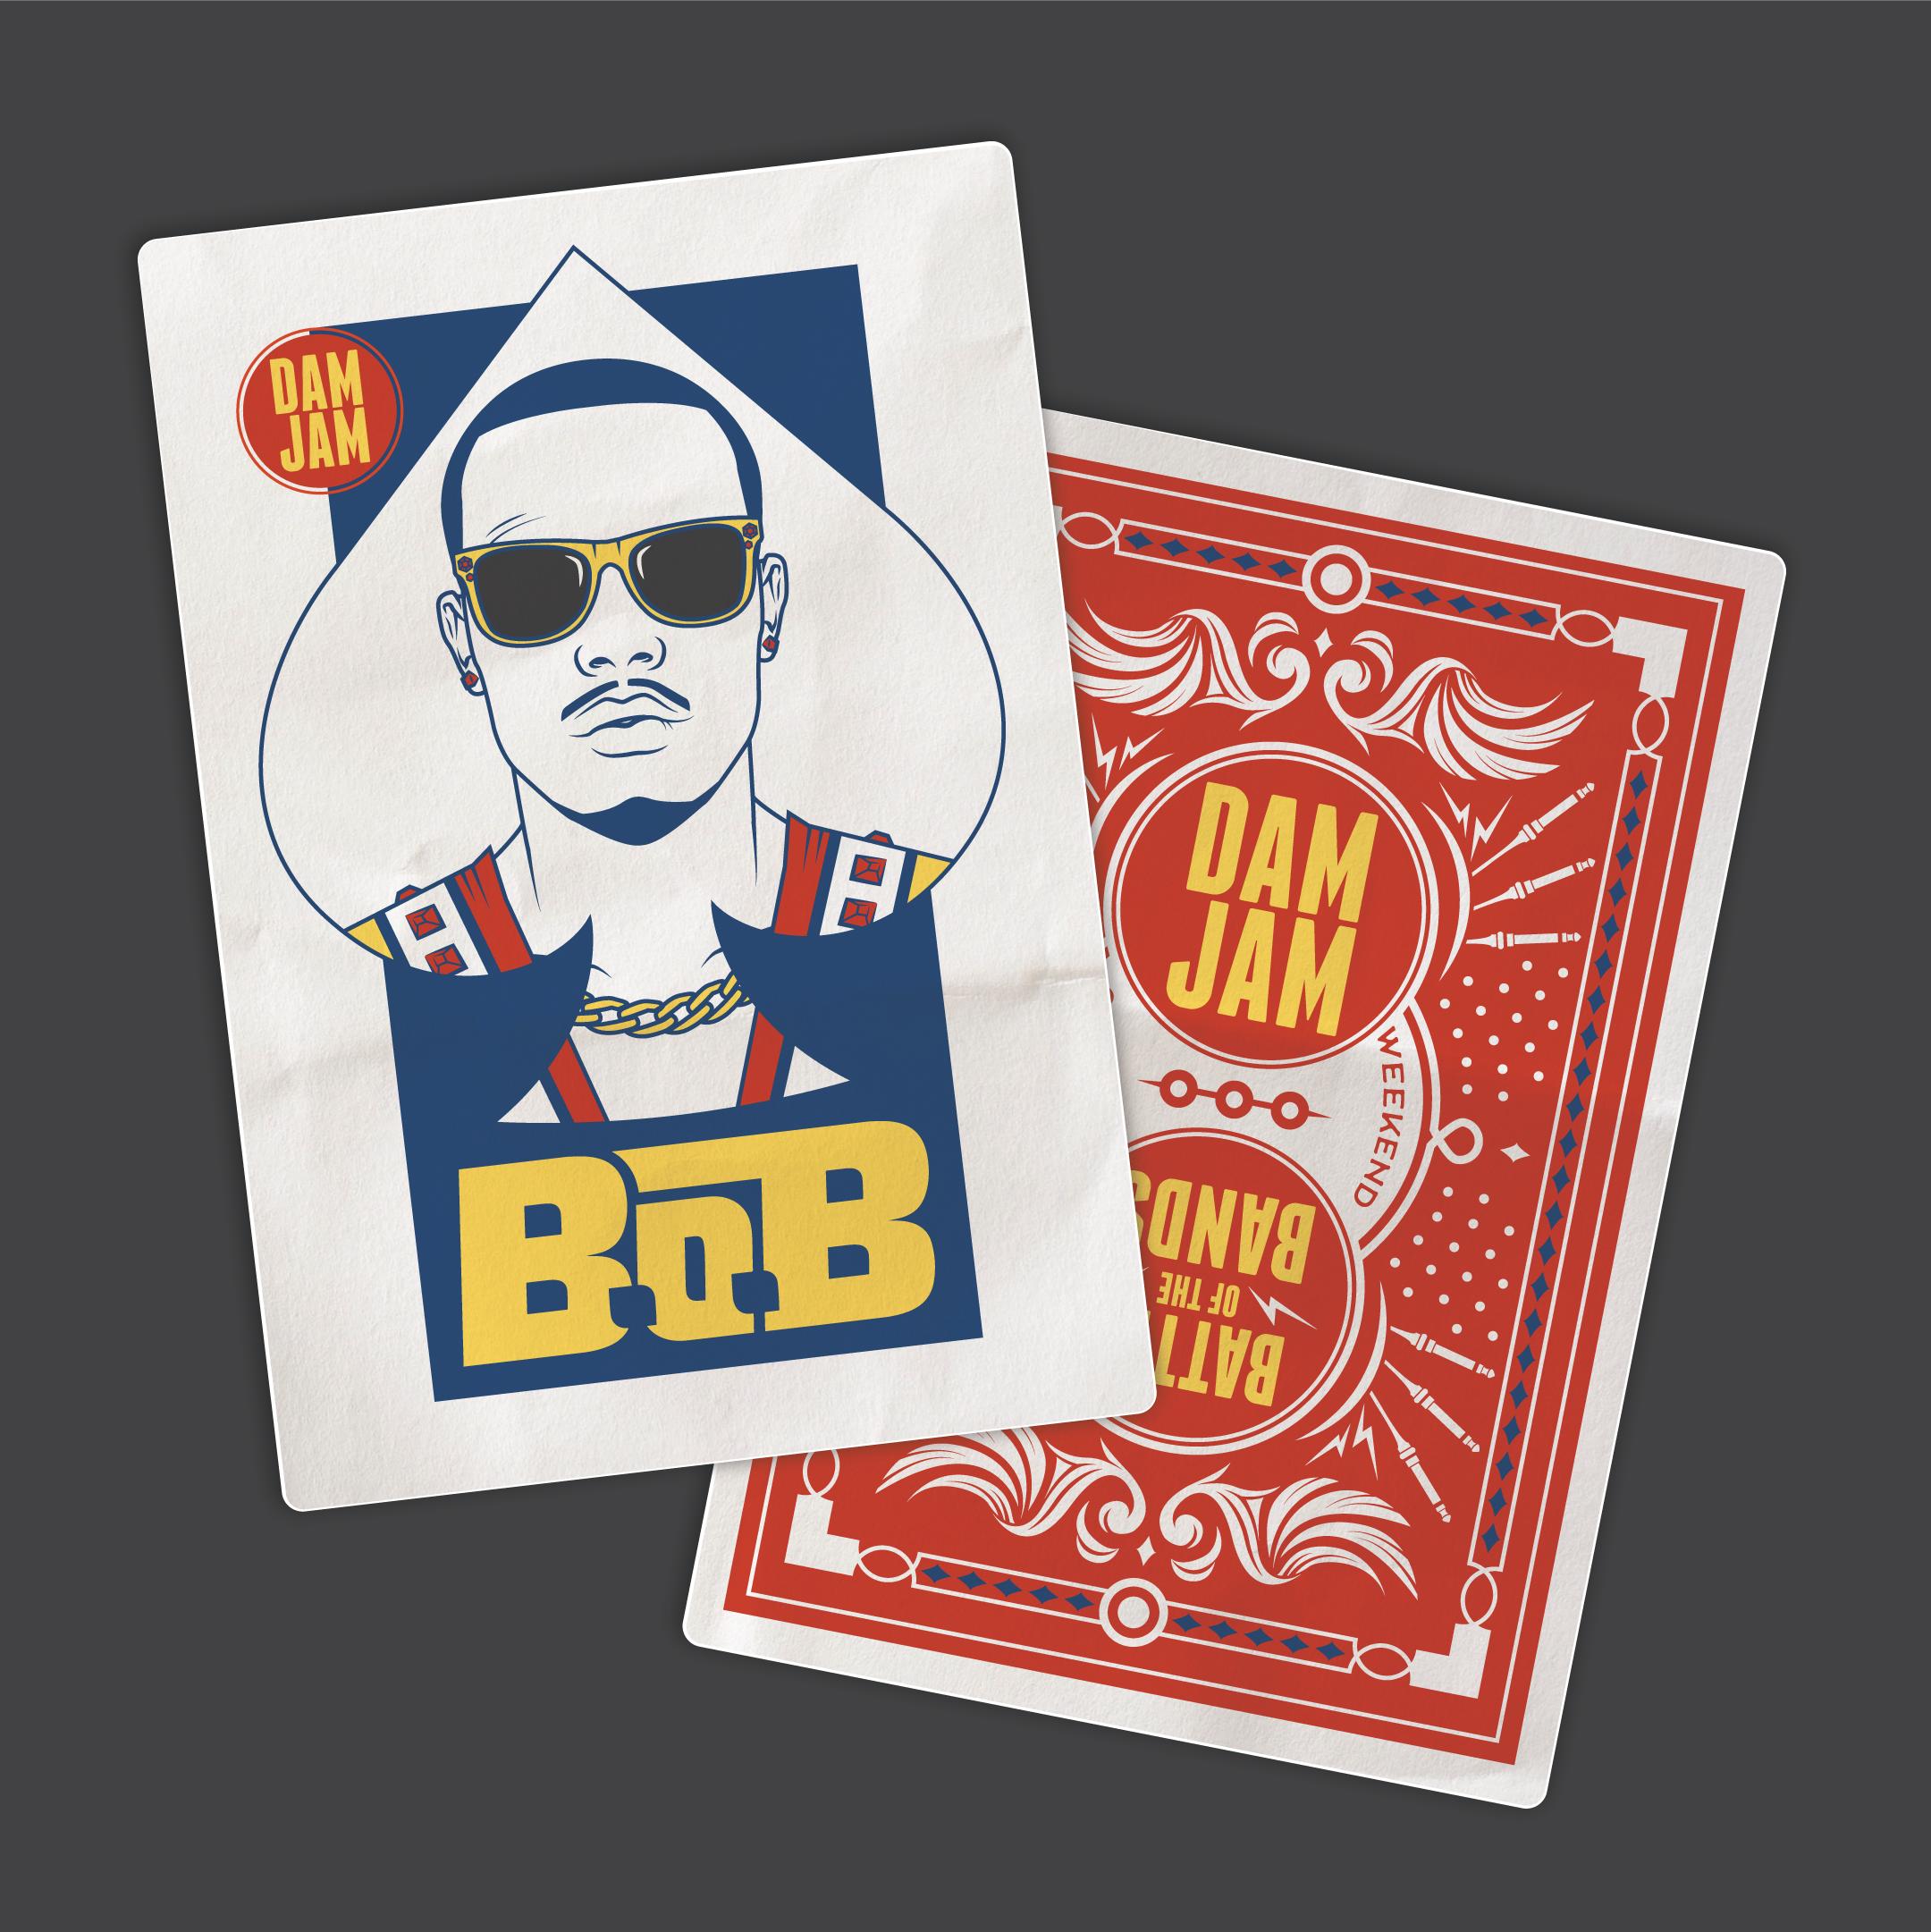 B.O.B Headliner